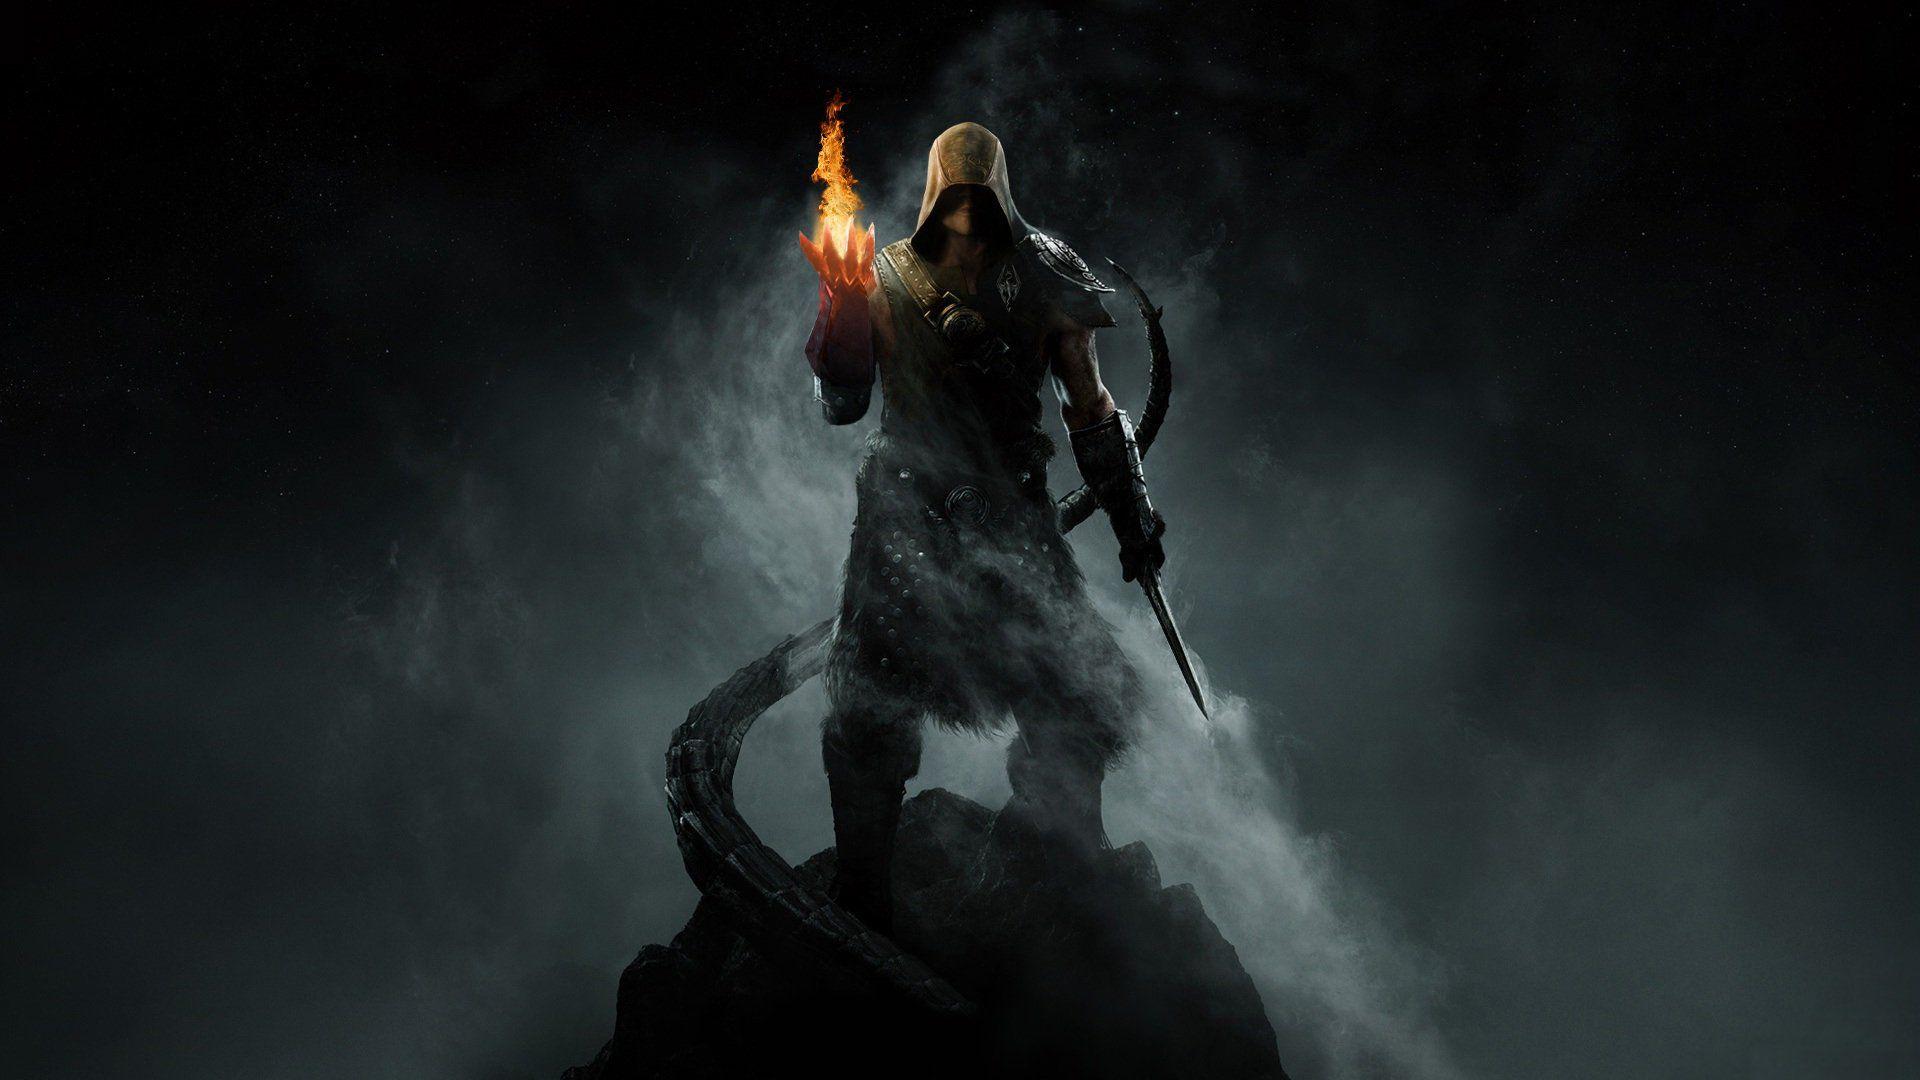 The Elder Scrolls V Skyrim 2011 How To Stop Running Out Of Magicka As A Pure Mage Skyrim Wallpaper Skyrim Mage Digital Wallpaper